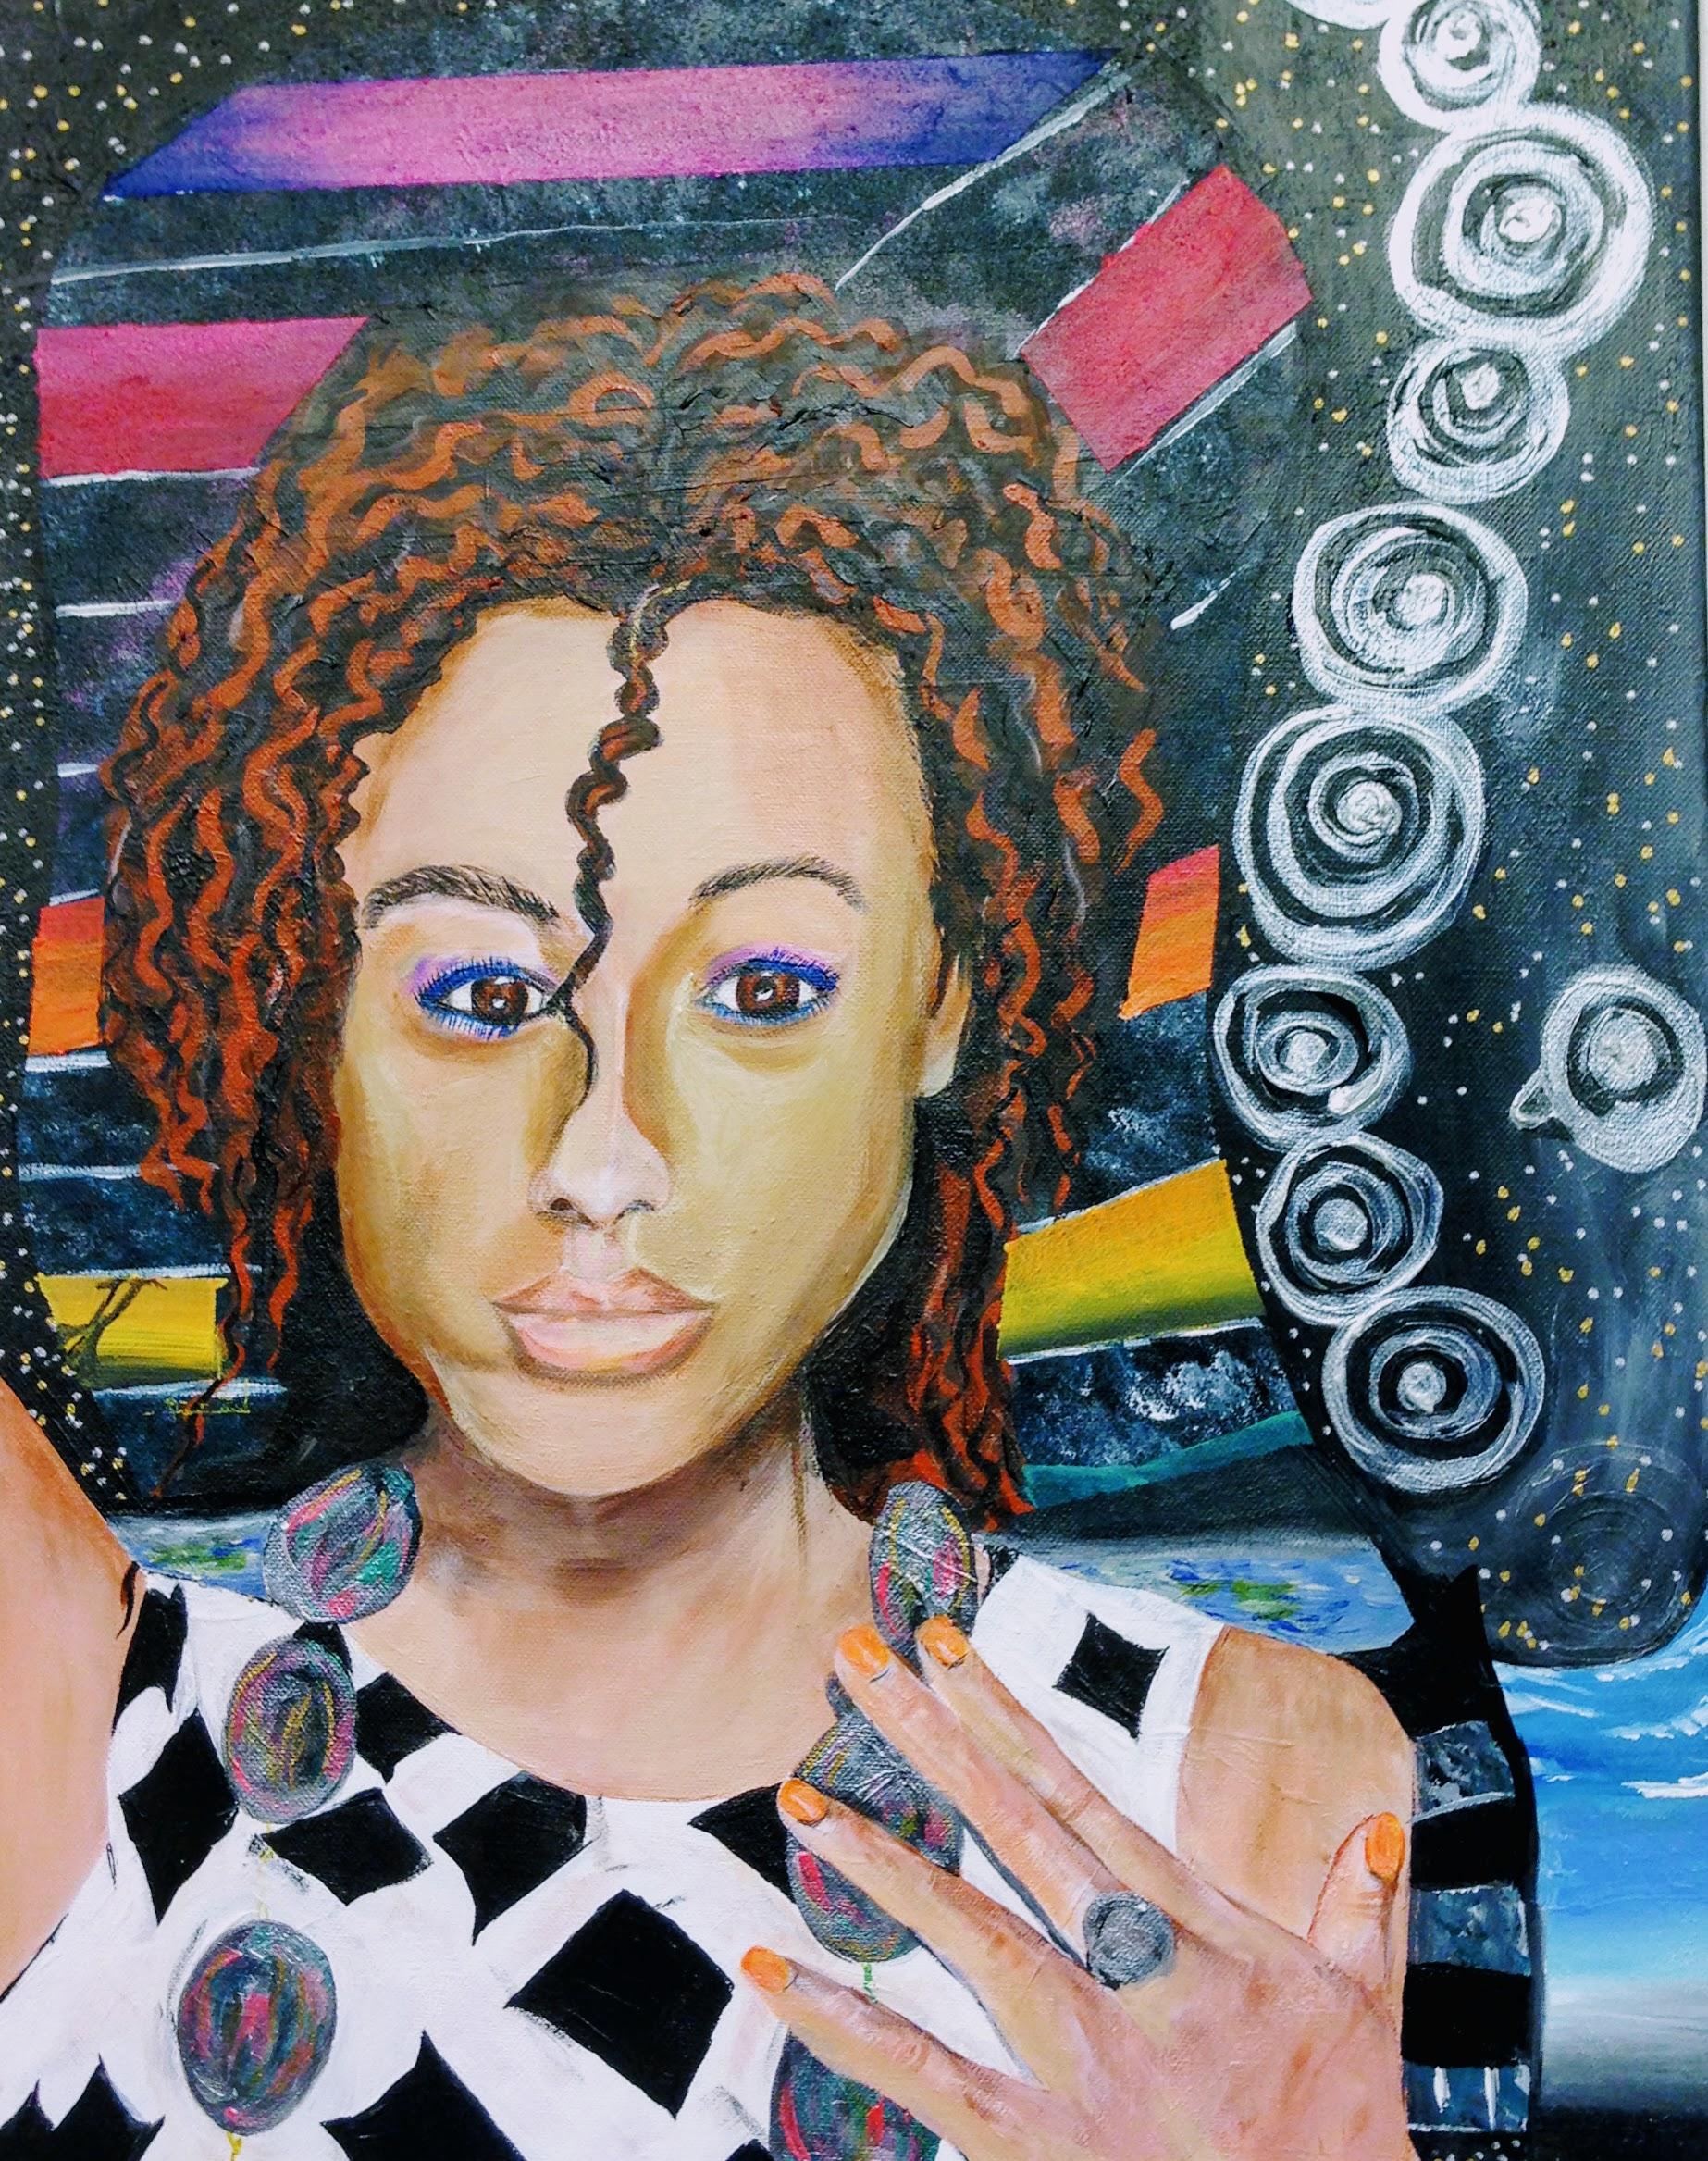 Kenyatta Johnson